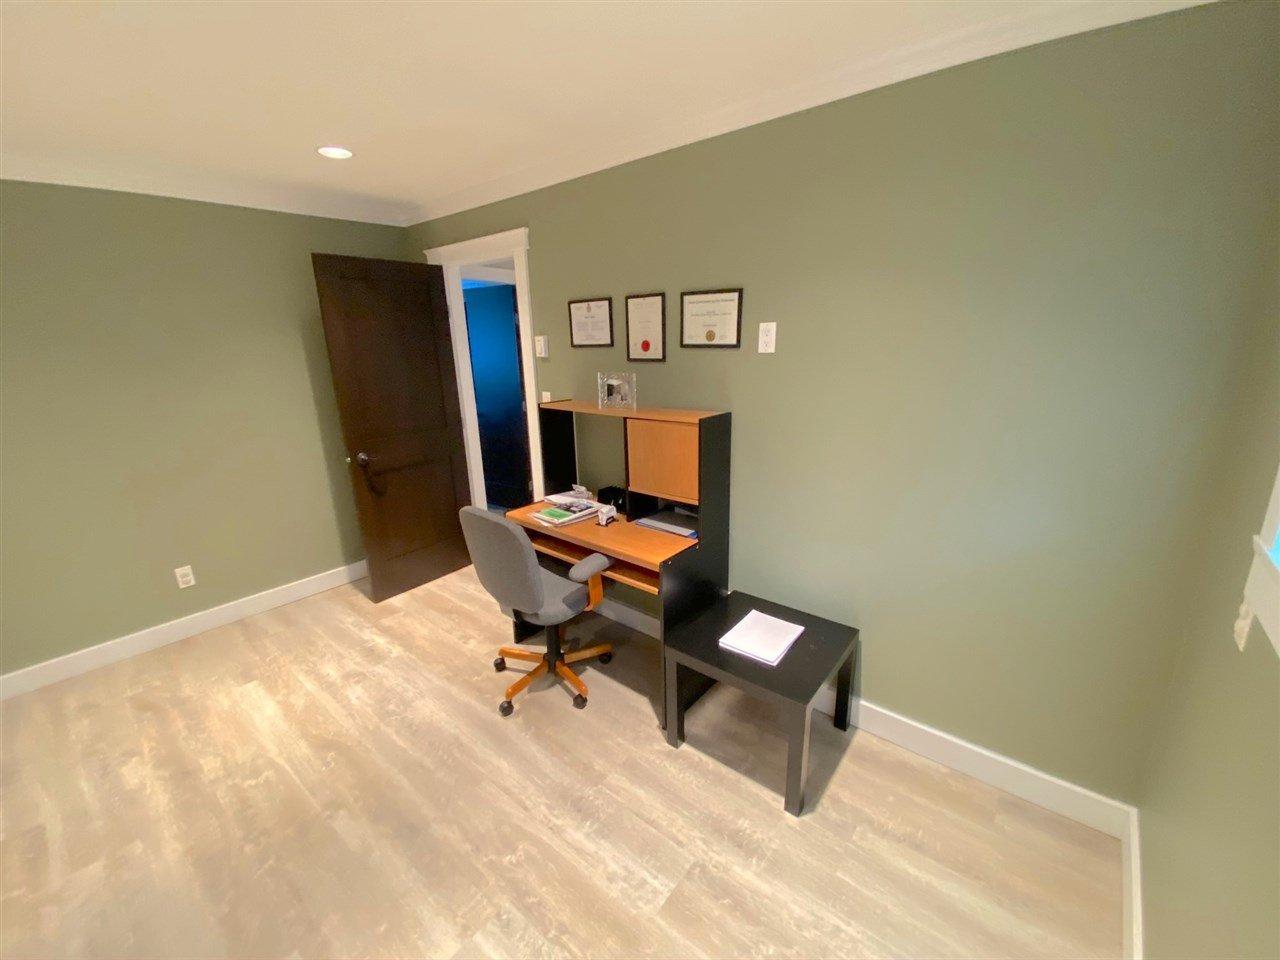 Photo 13: Photos: 555 55A STREET in Delta: Pebble Hill House for sale (Tsawwassen)  : MLS®# R2481635